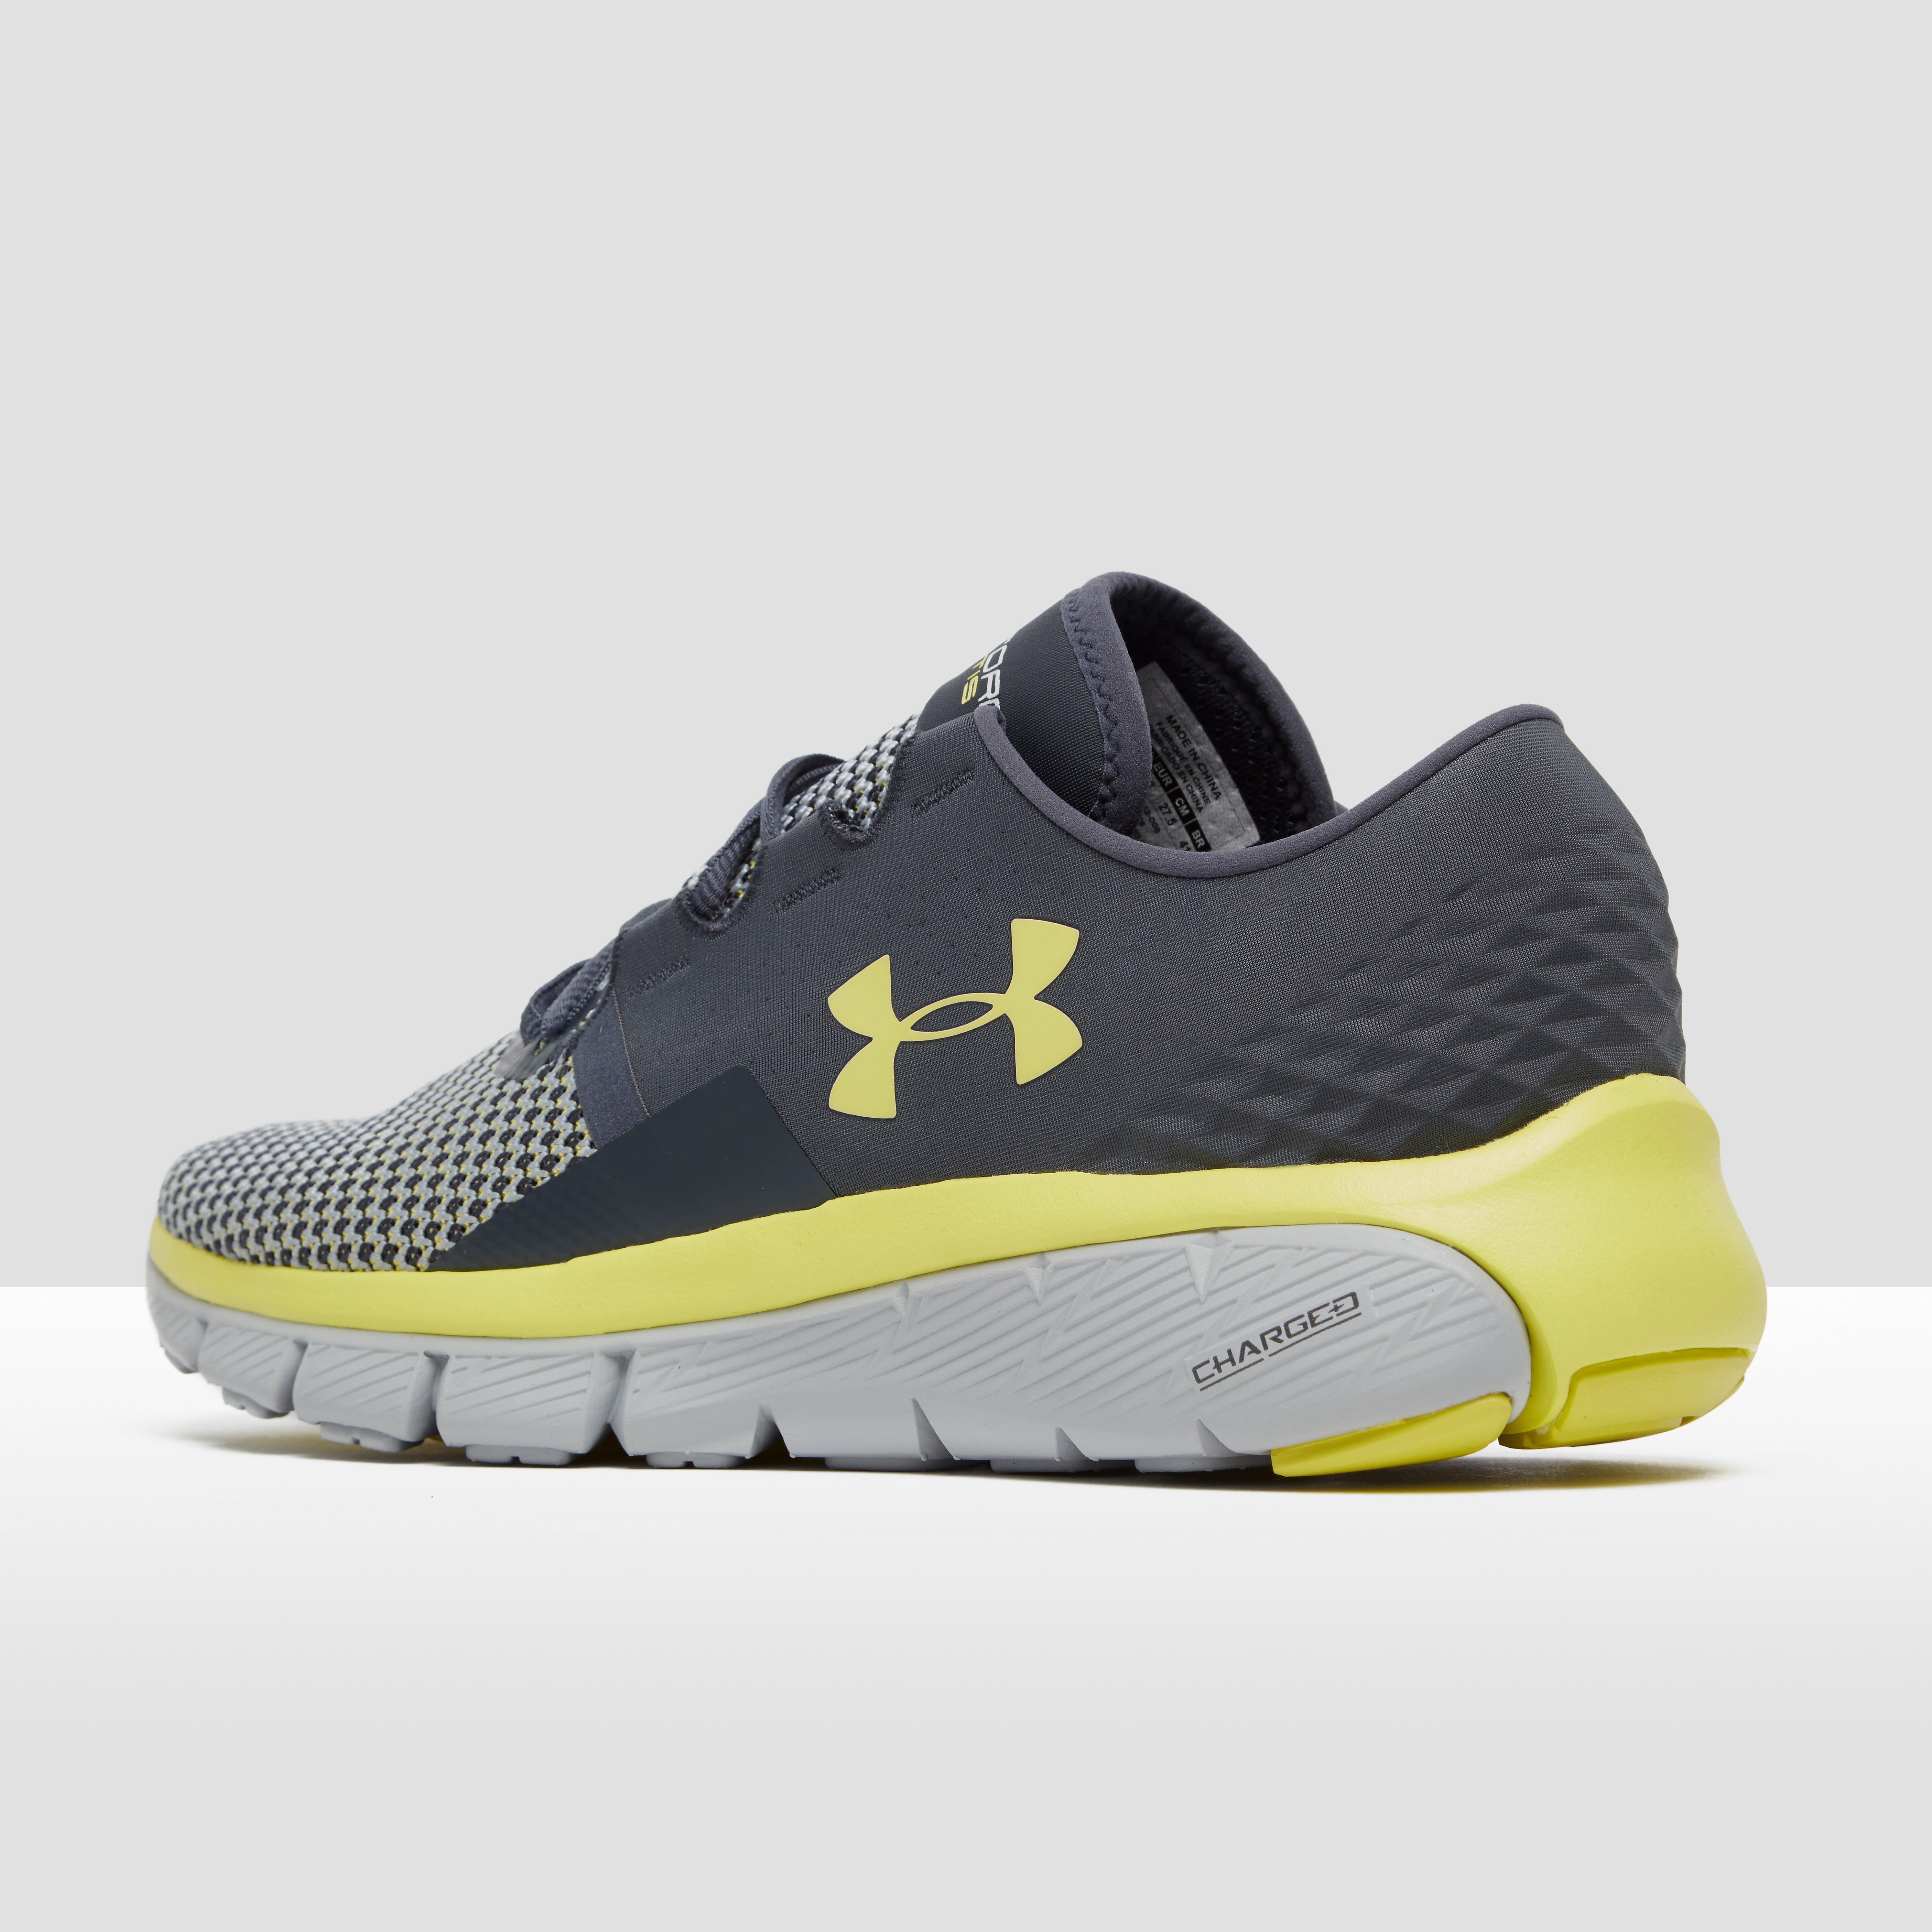 Under Armour Men's SpeedForm Fortis 2 Running Shoes